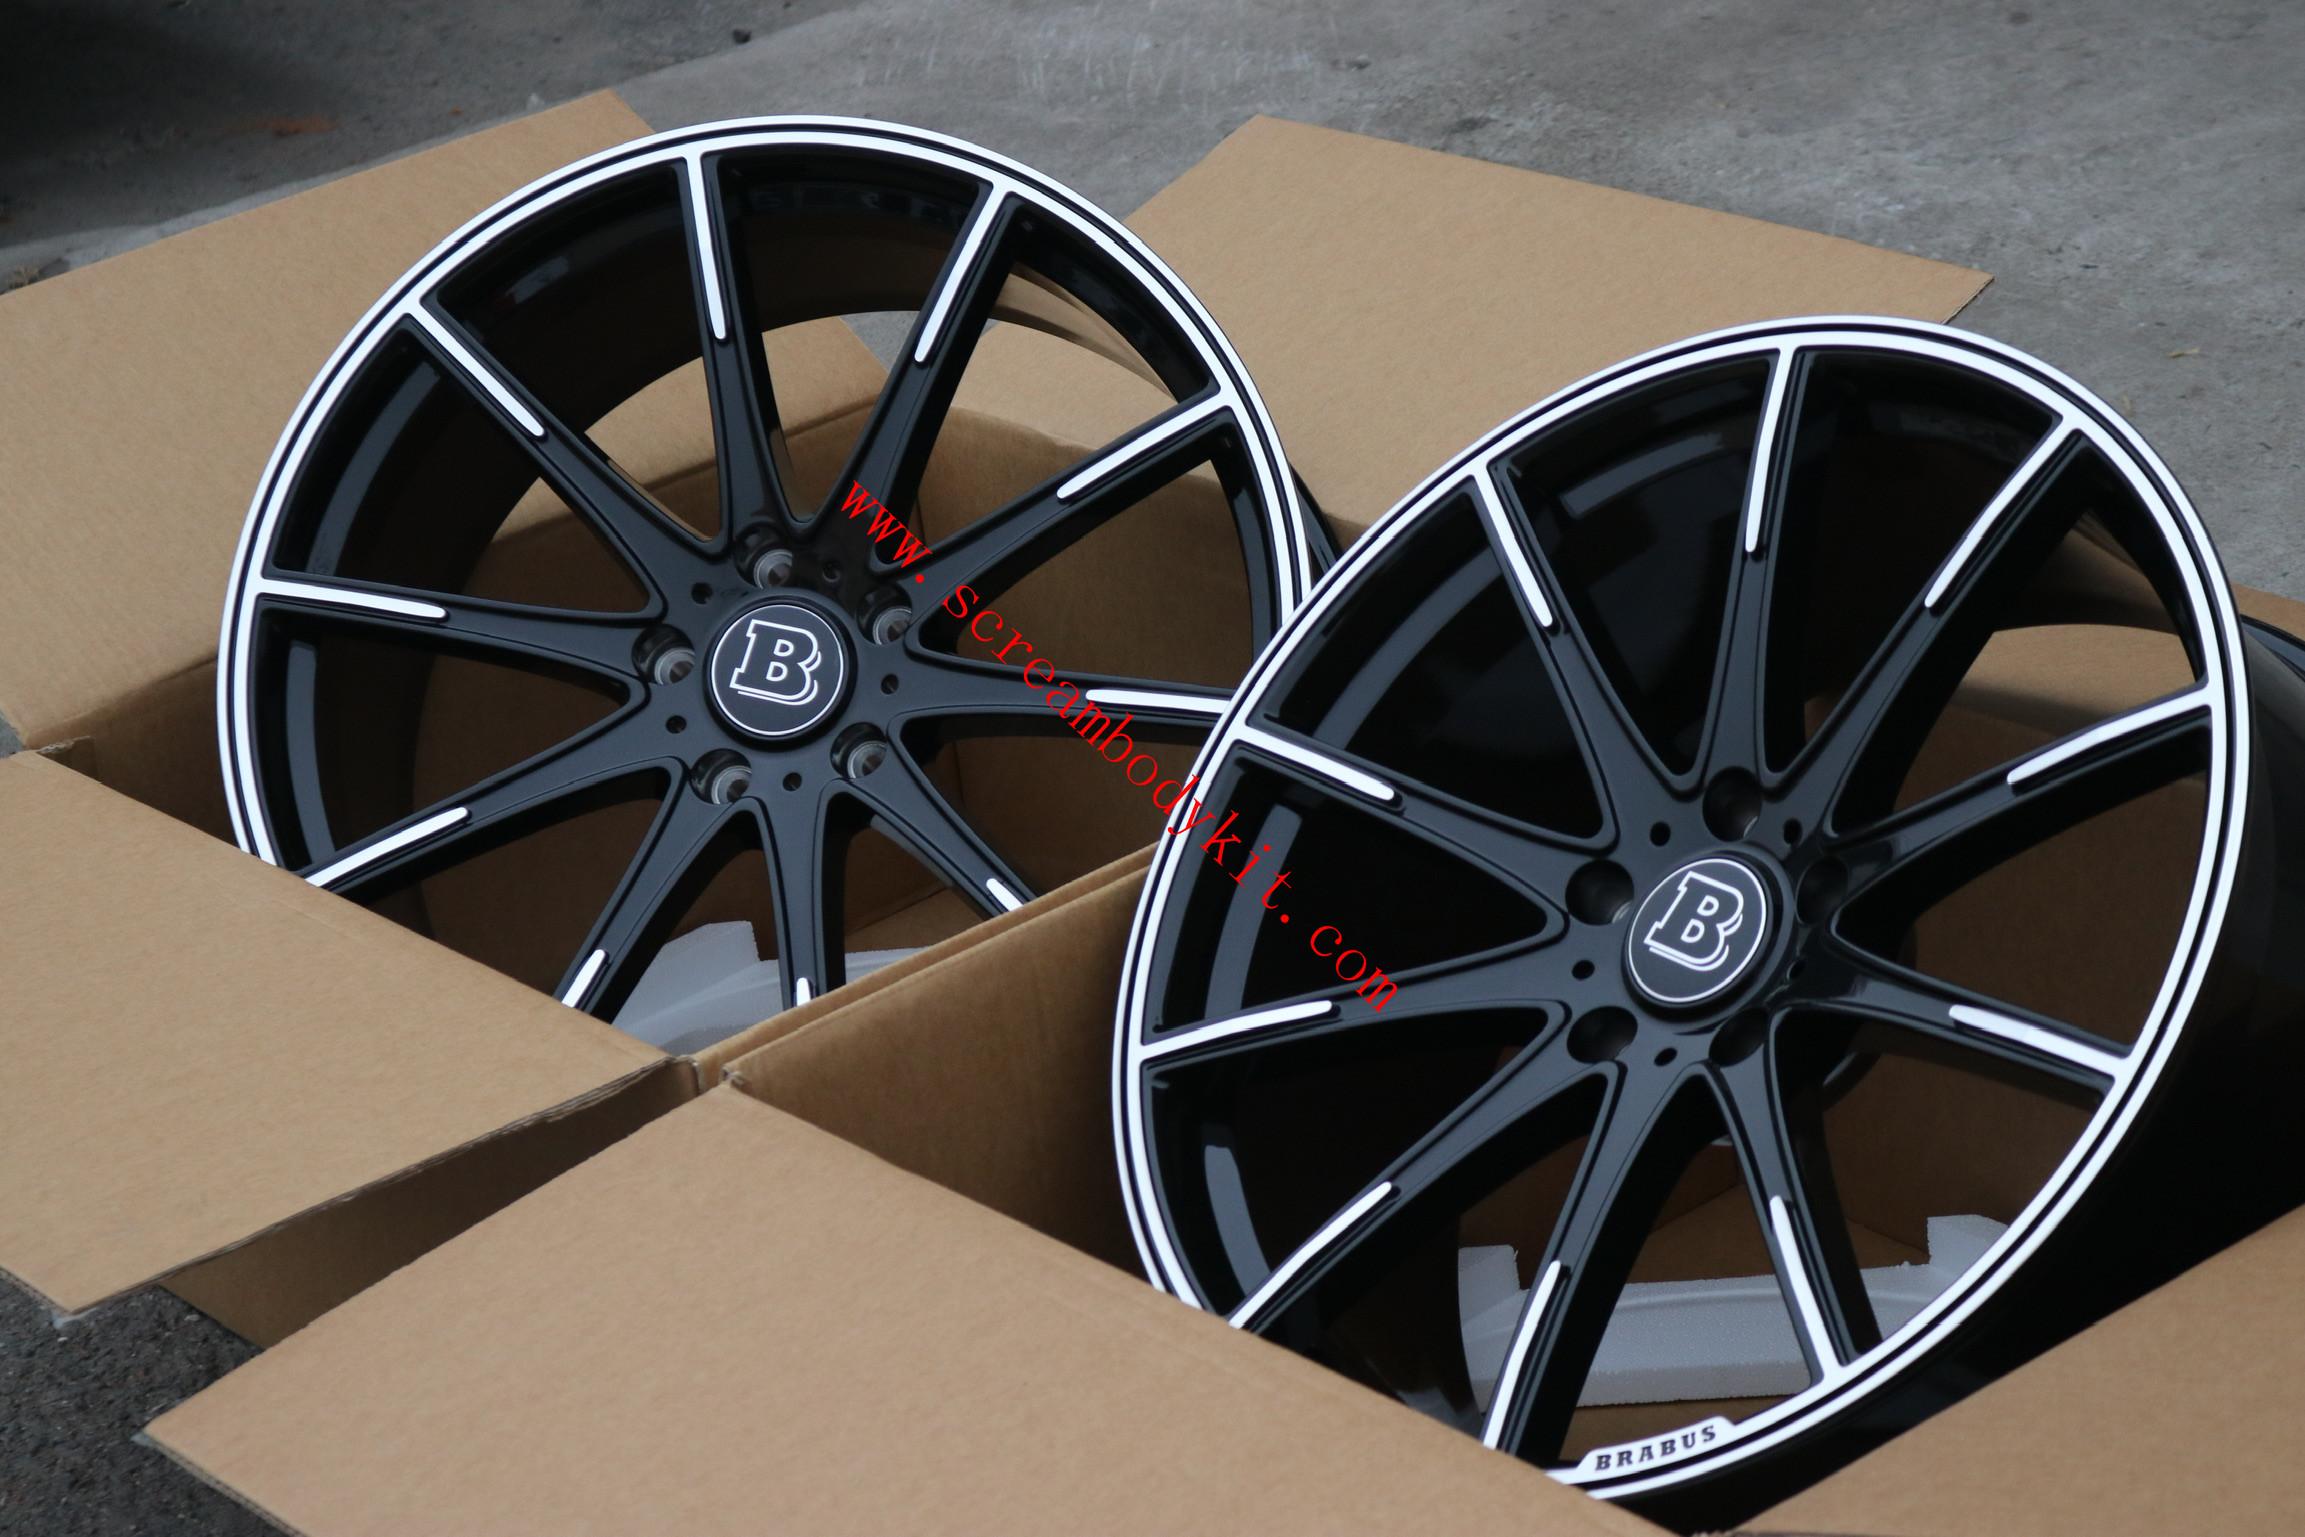 Mercedes-benz Brabus forge rims wheels 18-23 size